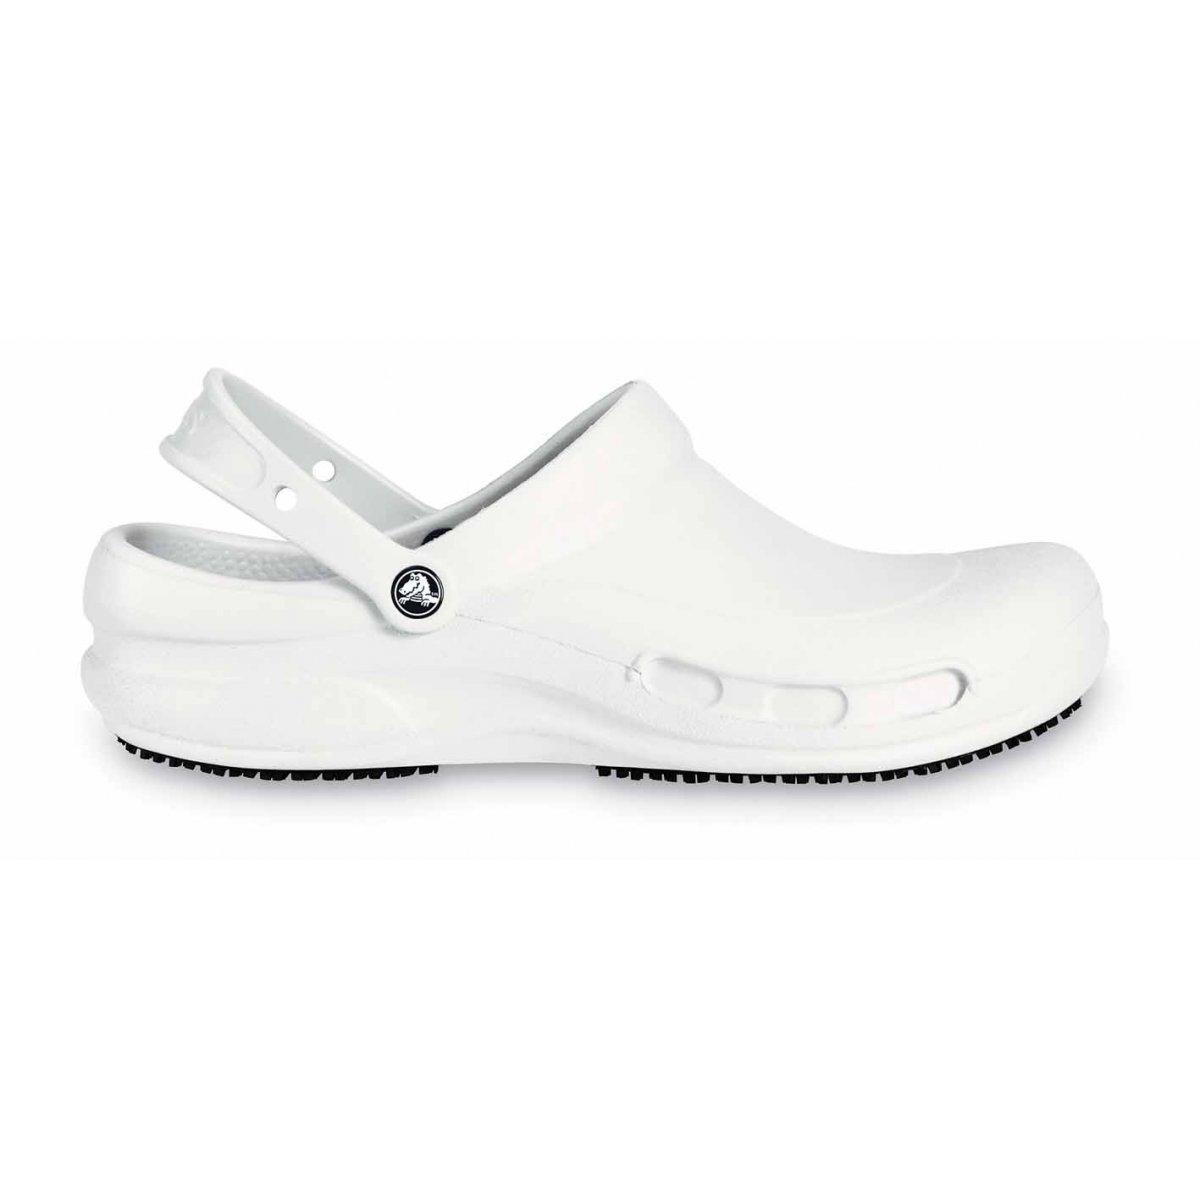 size 40 46135 9098a Bistro Sabot U - Sabot Footwear Uomo | Crocs Italia